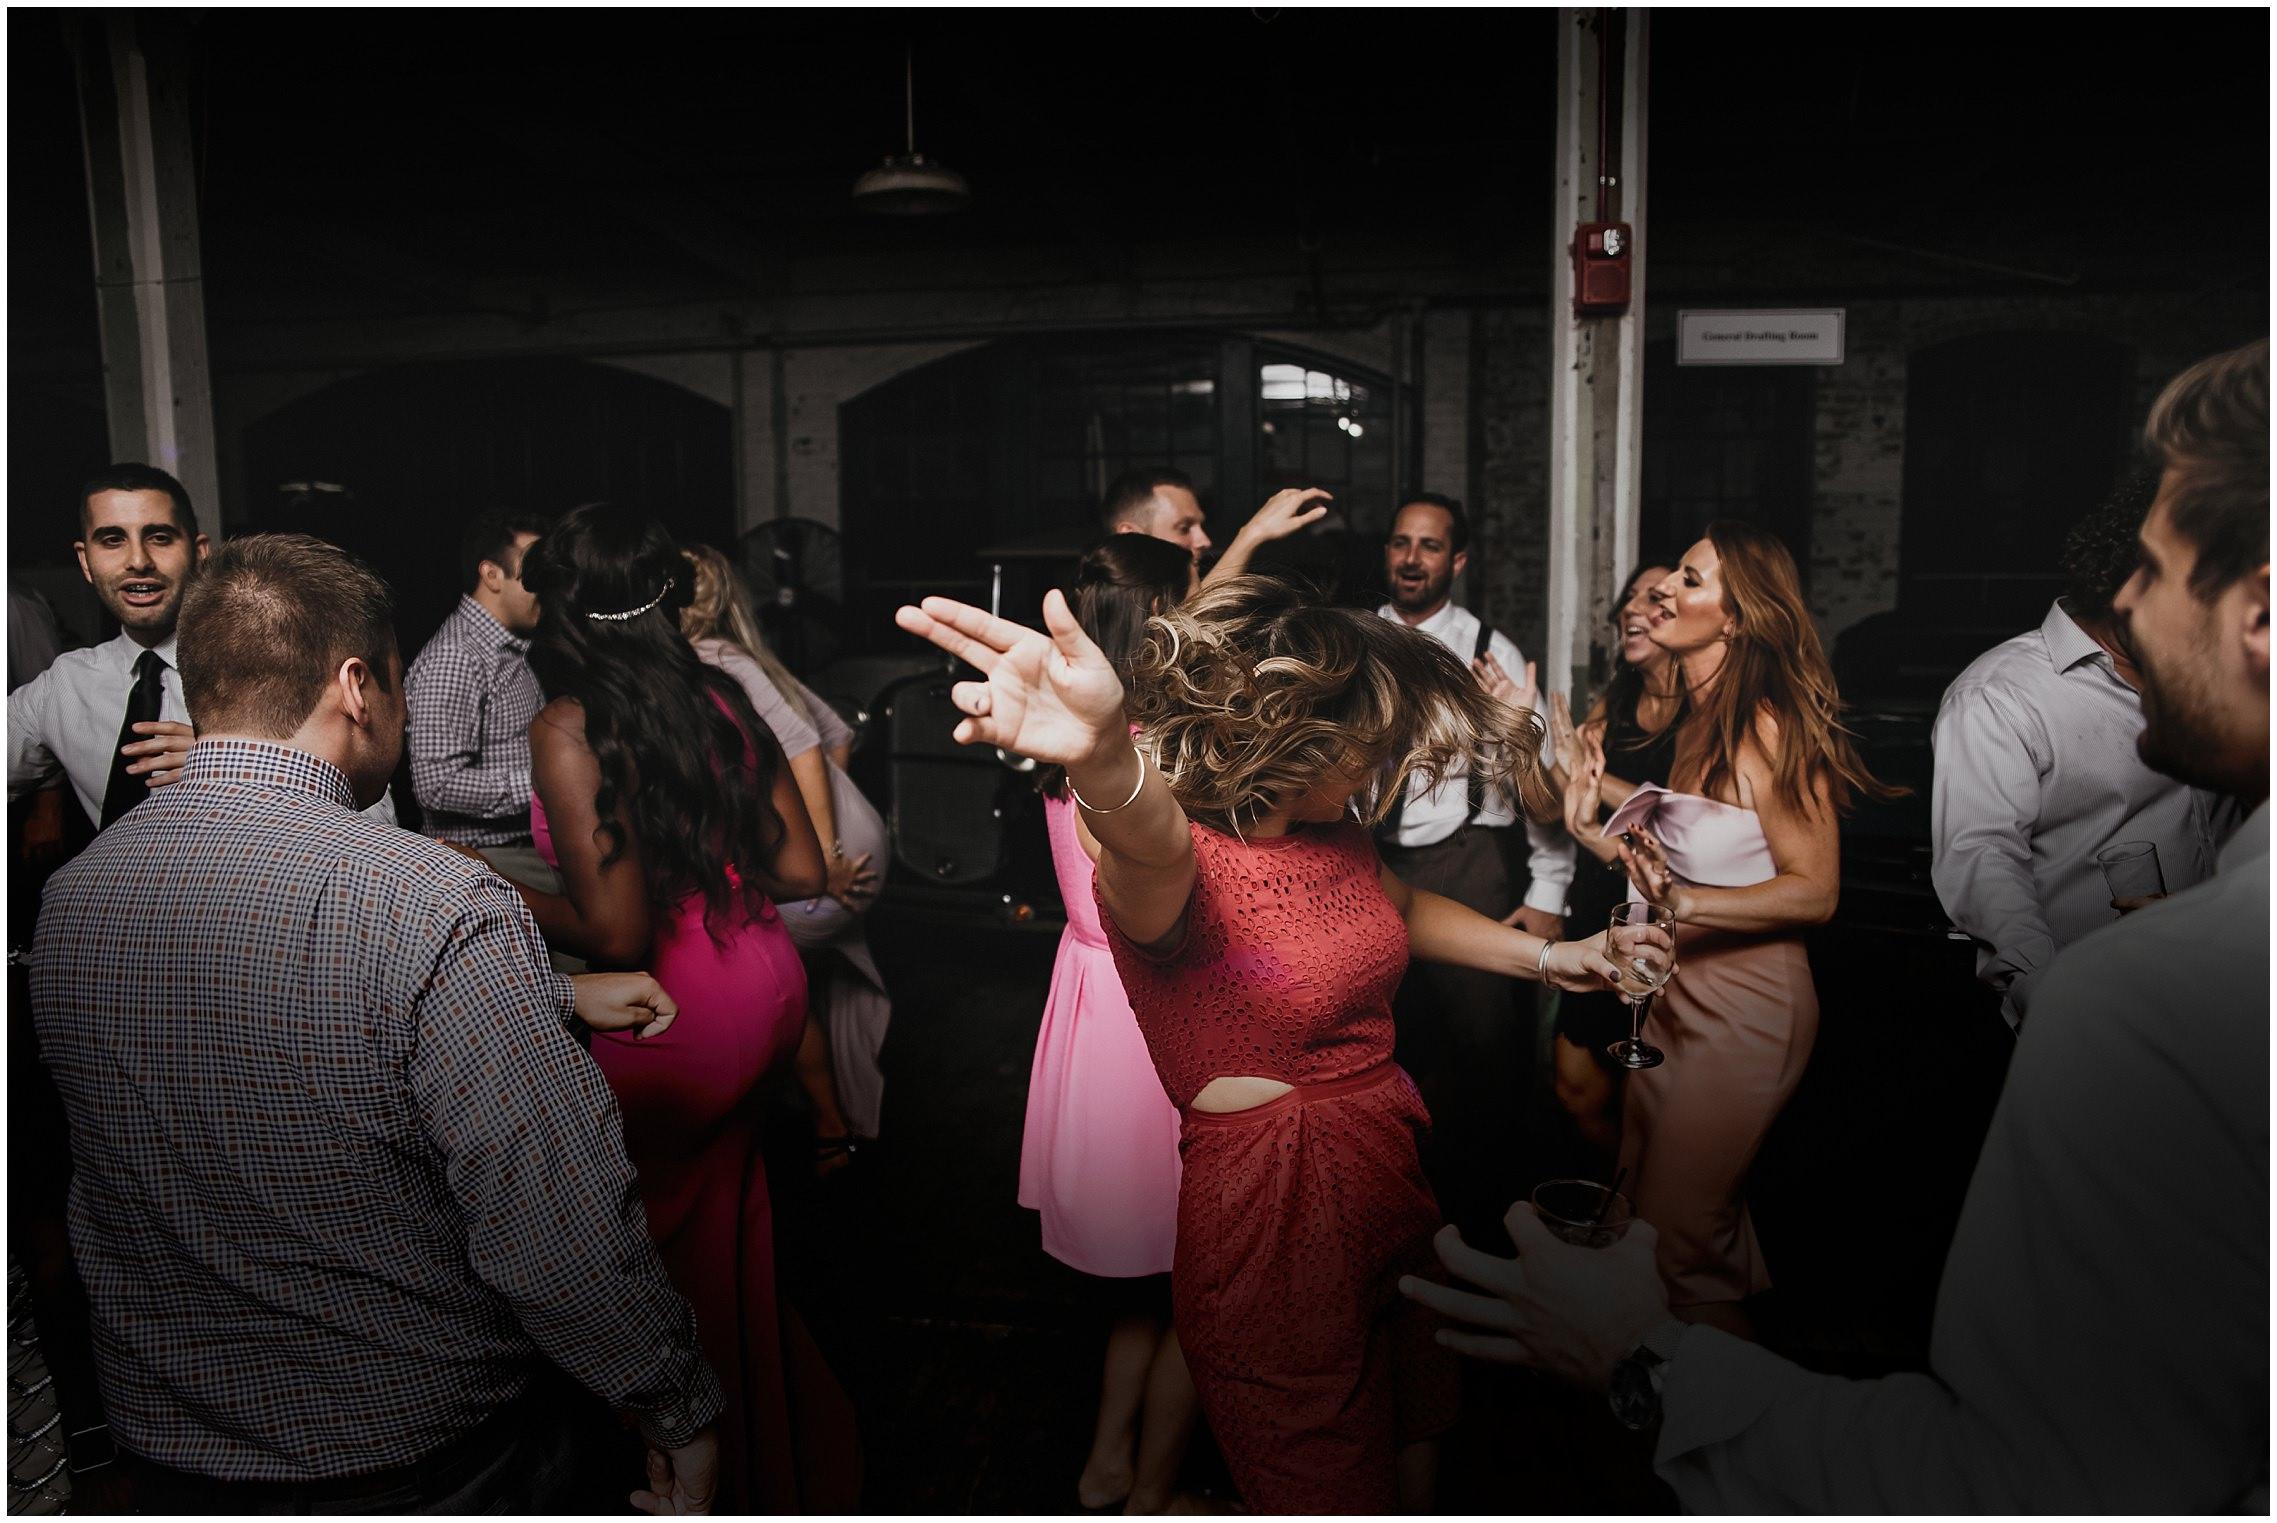 brick_and_mortar_colorado_wedding_photographer_0243.jpg